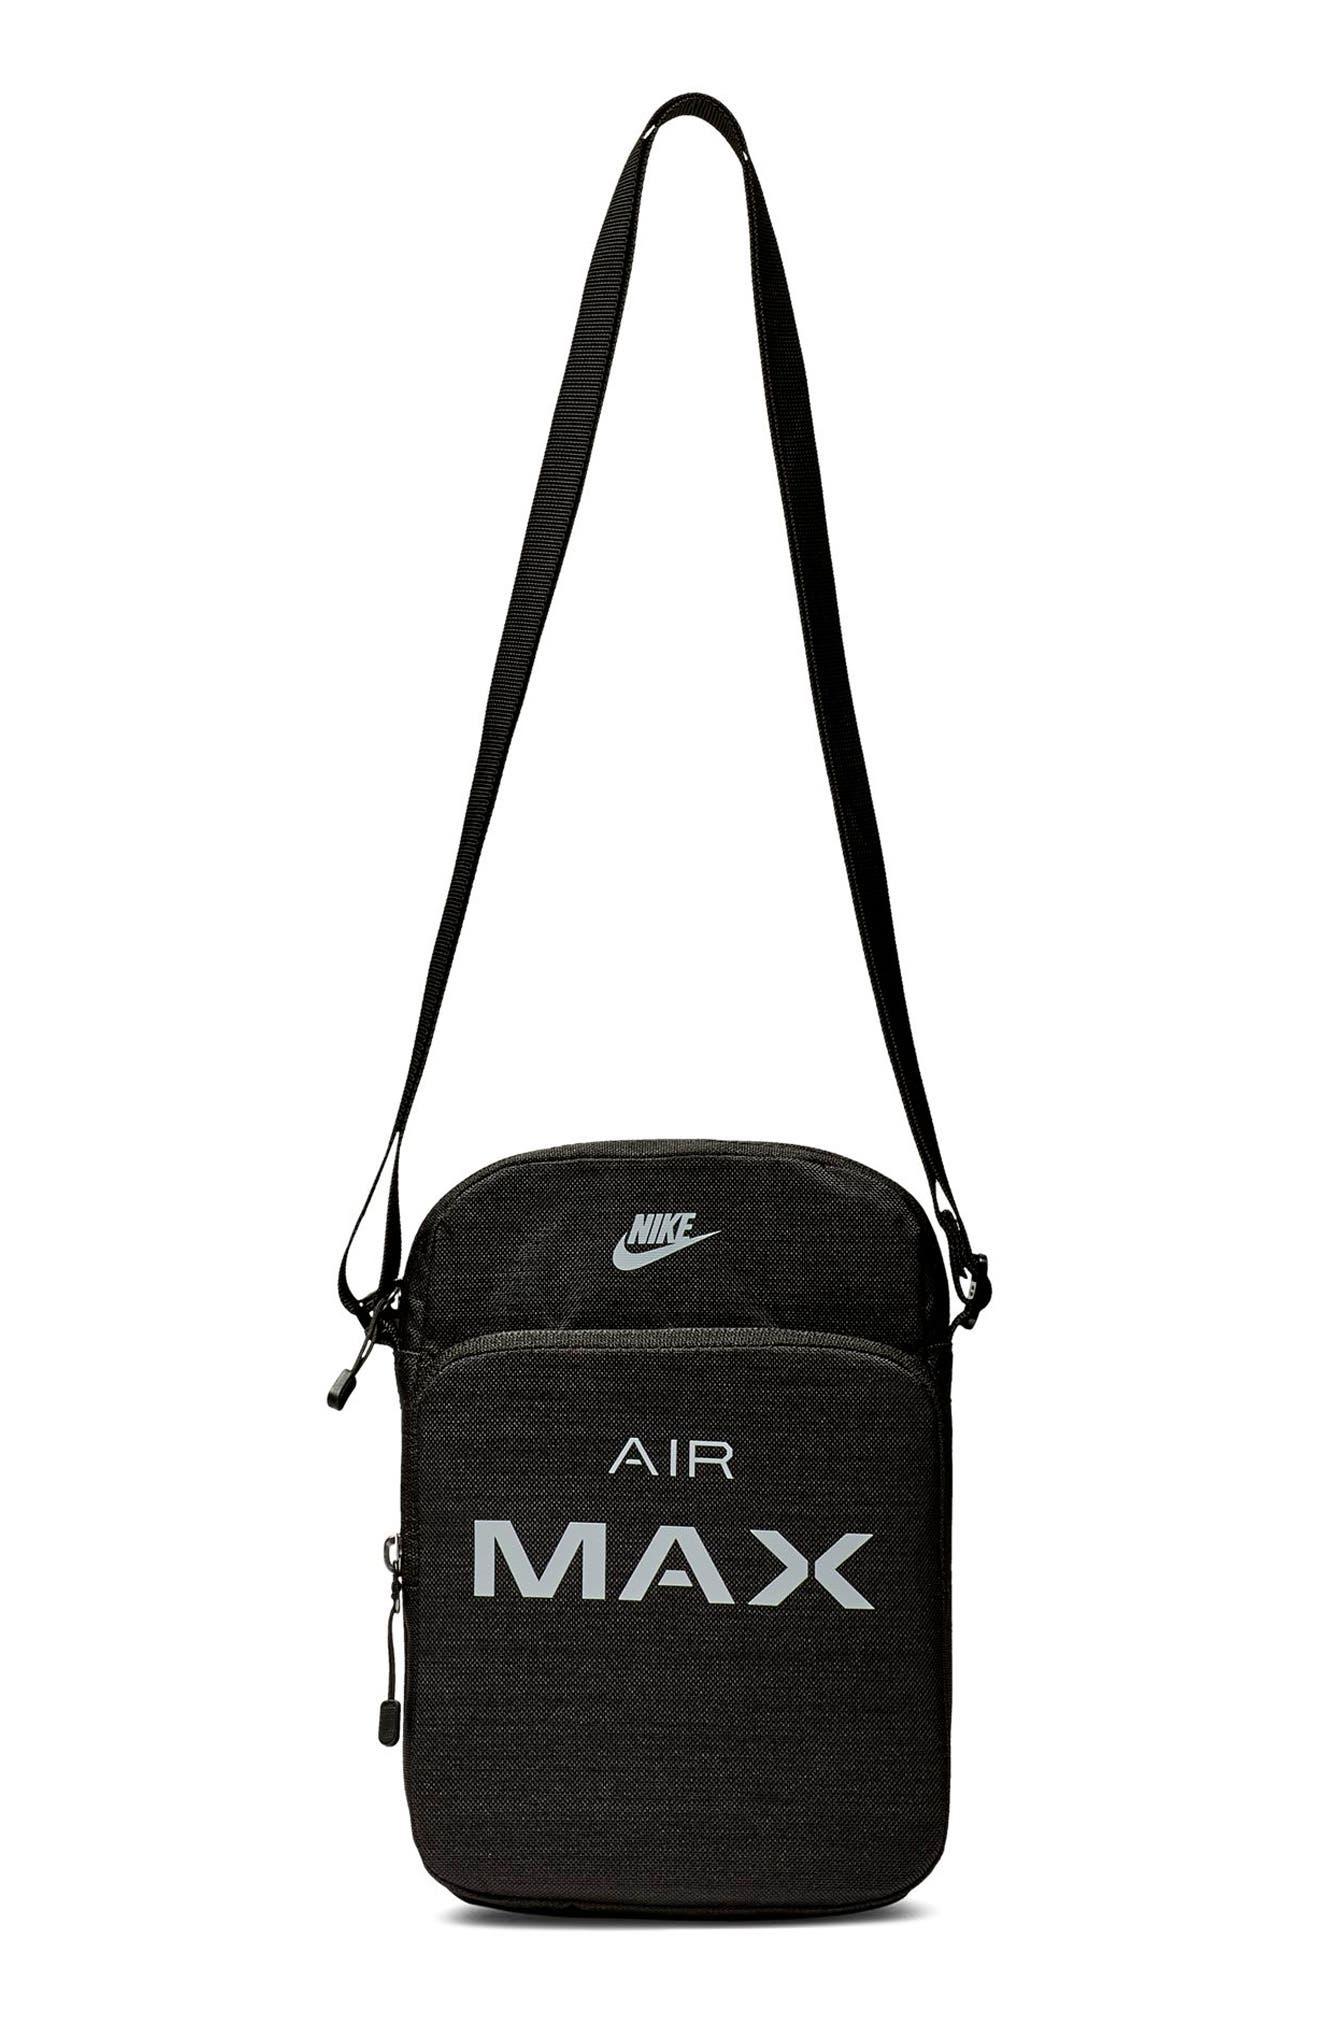 Air Max Small Items Bag by Nike